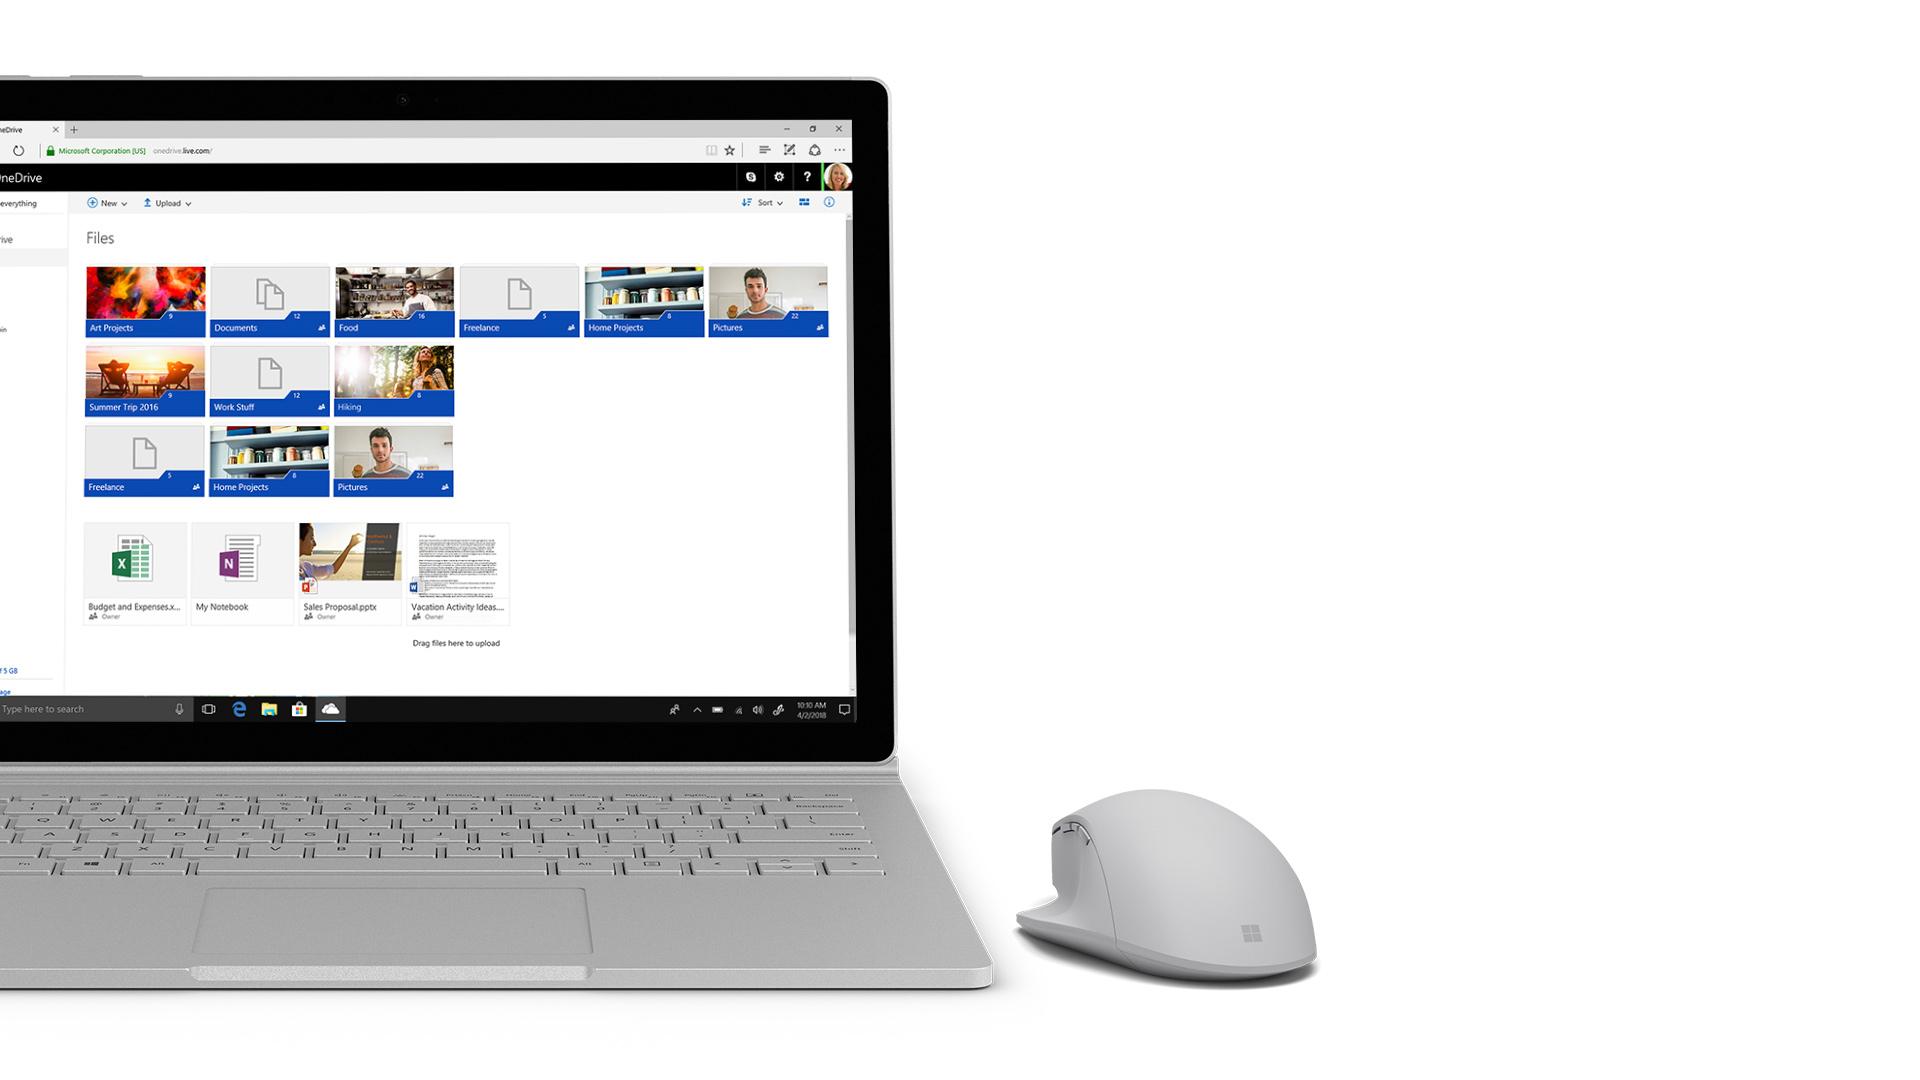 Surface 显示 OneDrive 屏幕截图。